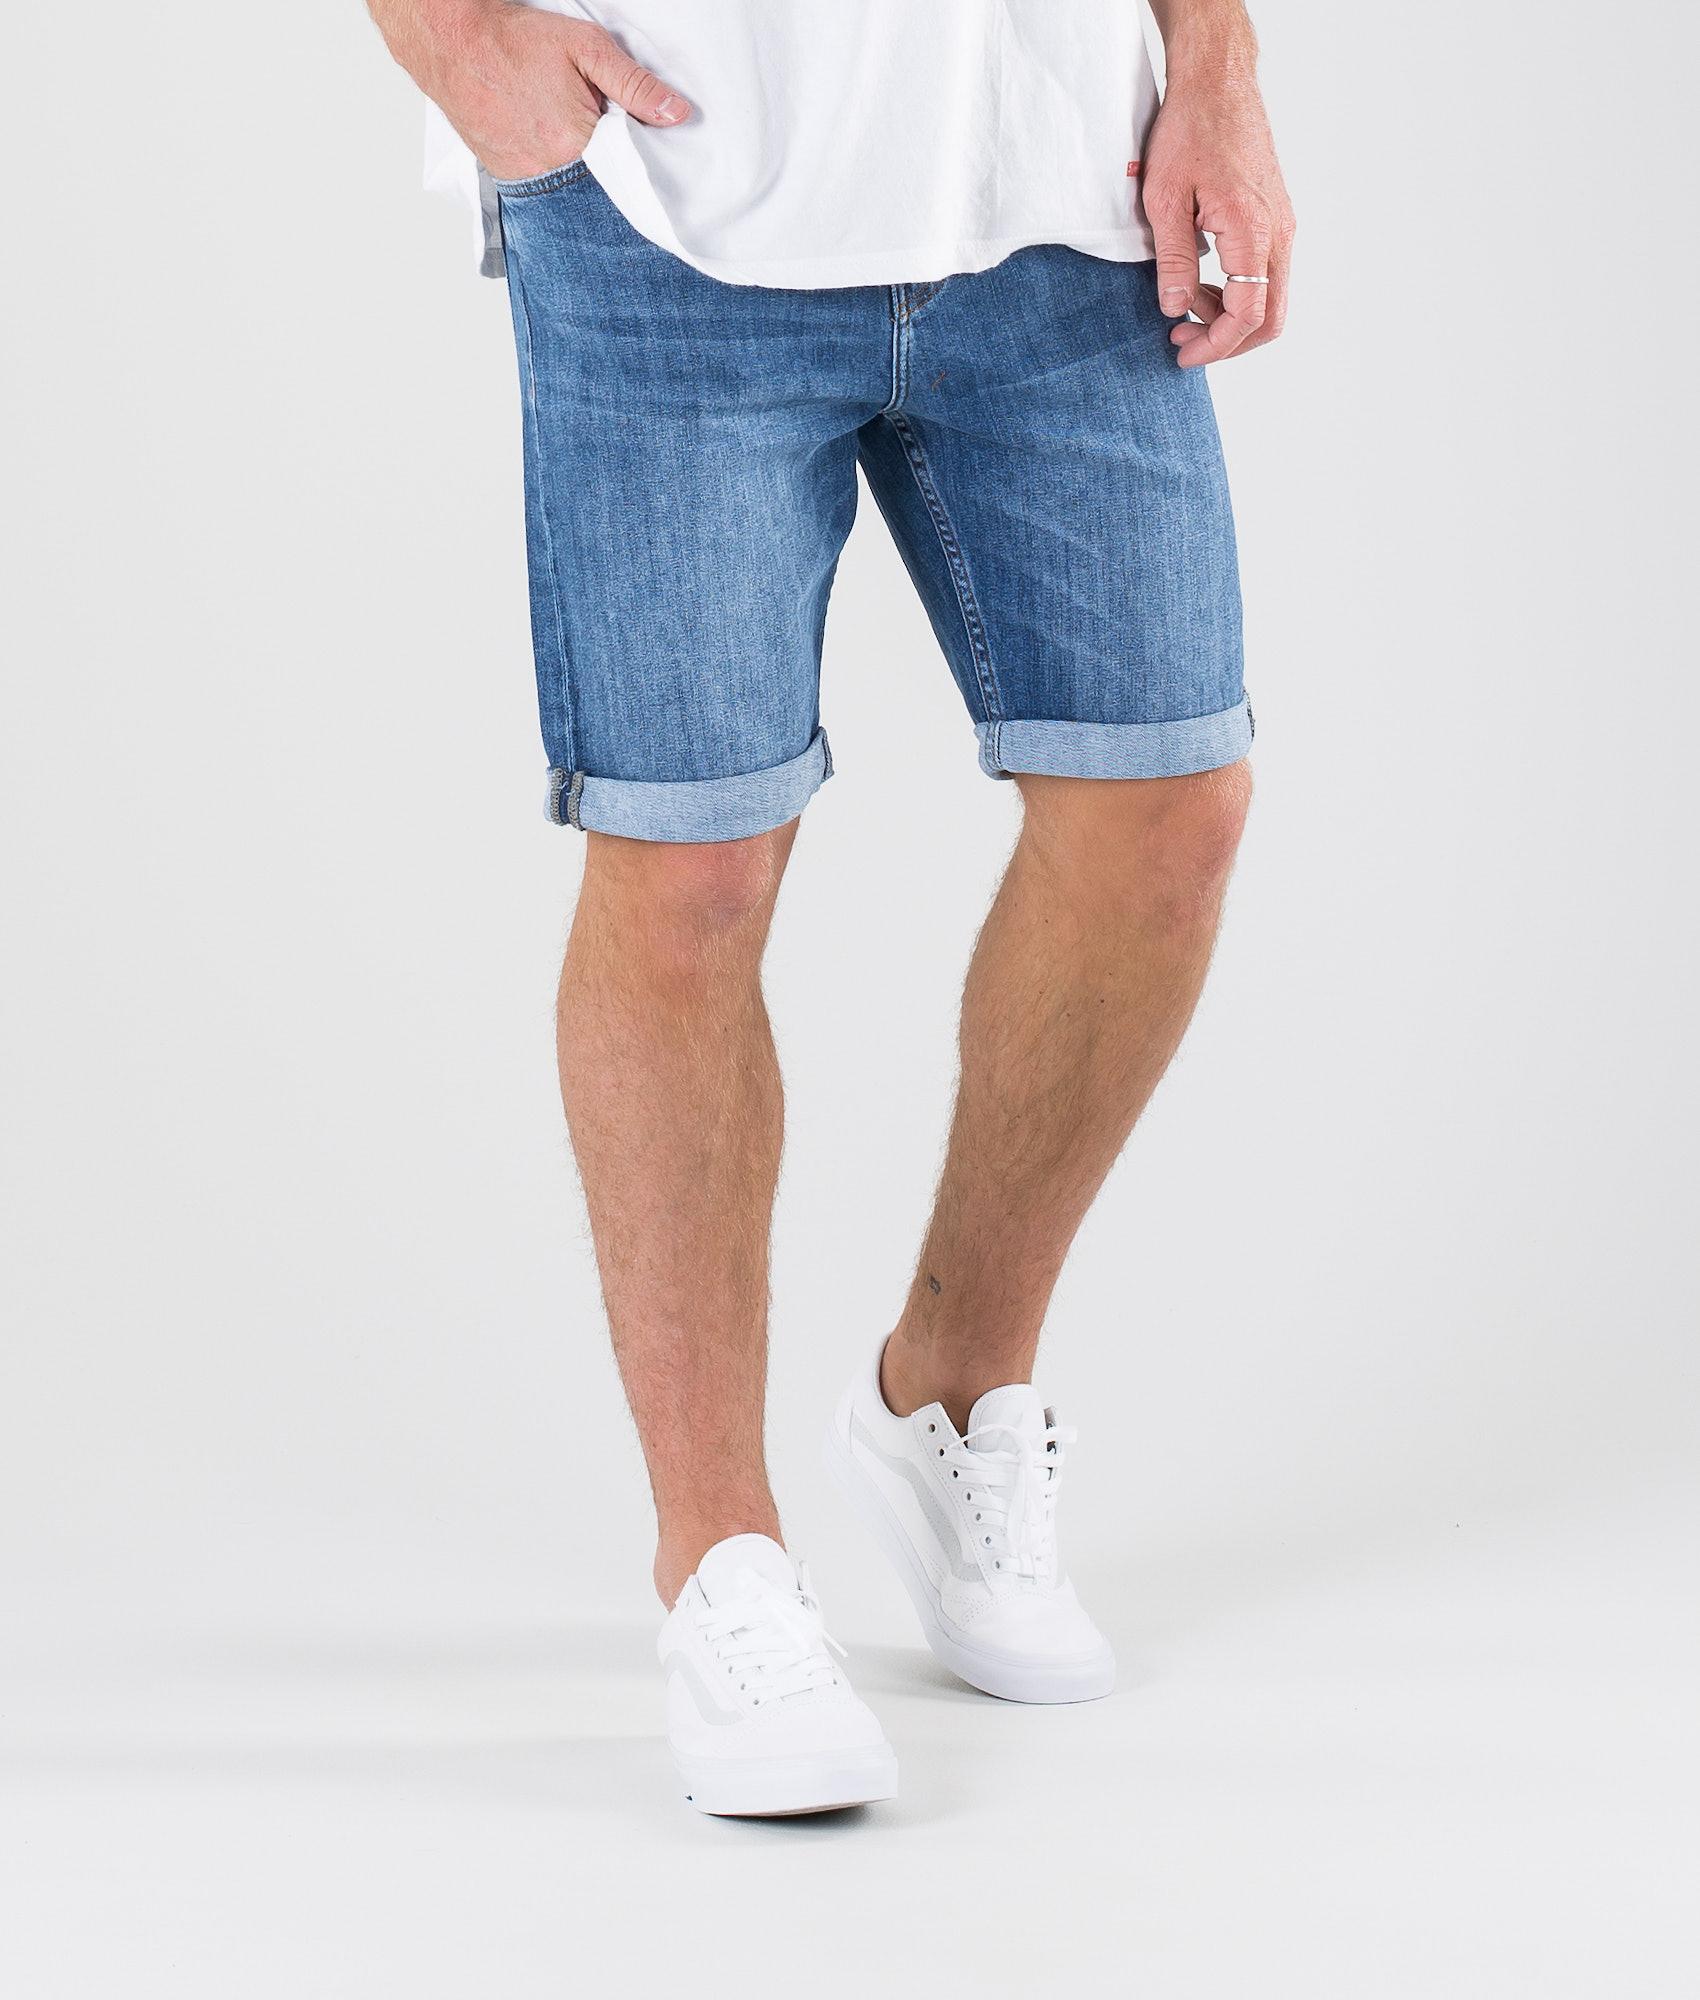 54b9a51472 Men's Streetwear Shorts | Free Delivery | RIDESTORE